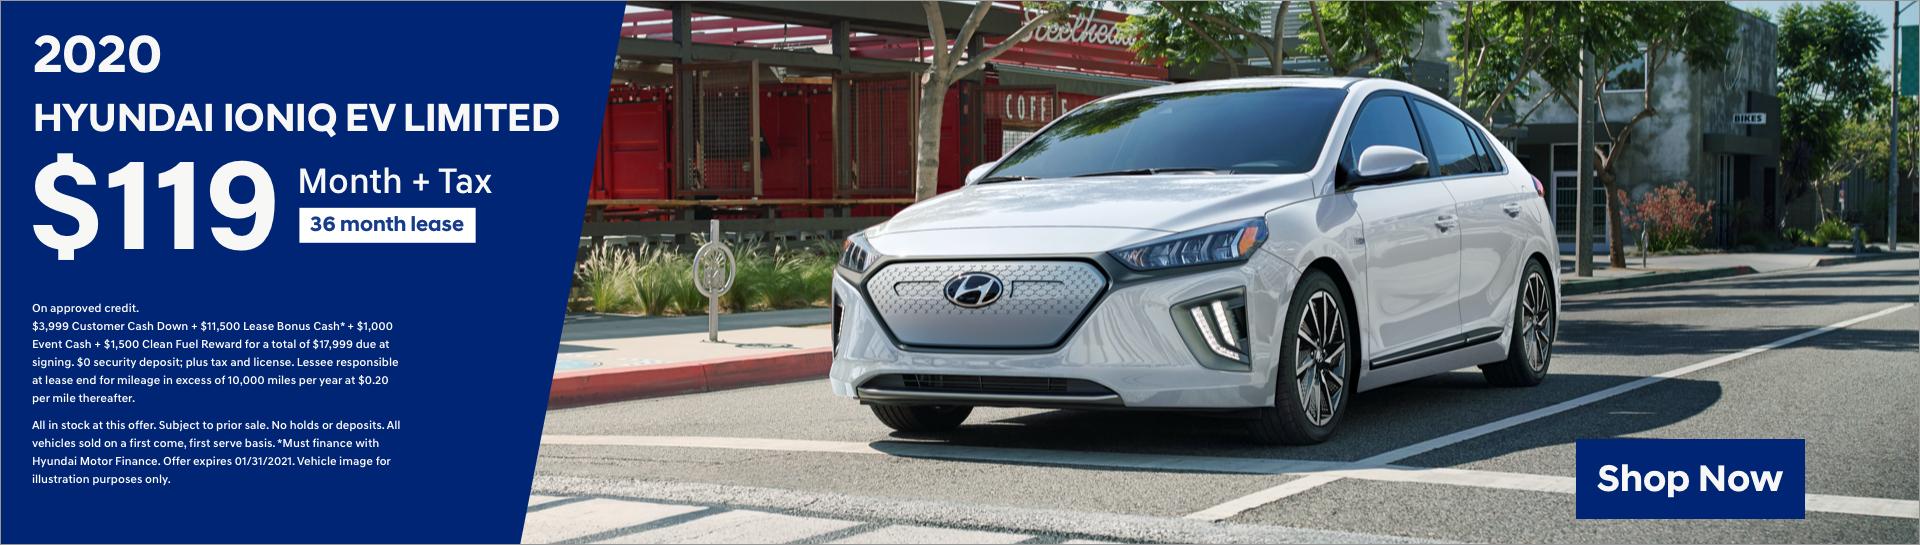 Jan 2020 Hyundai IONIQ EV Desktop